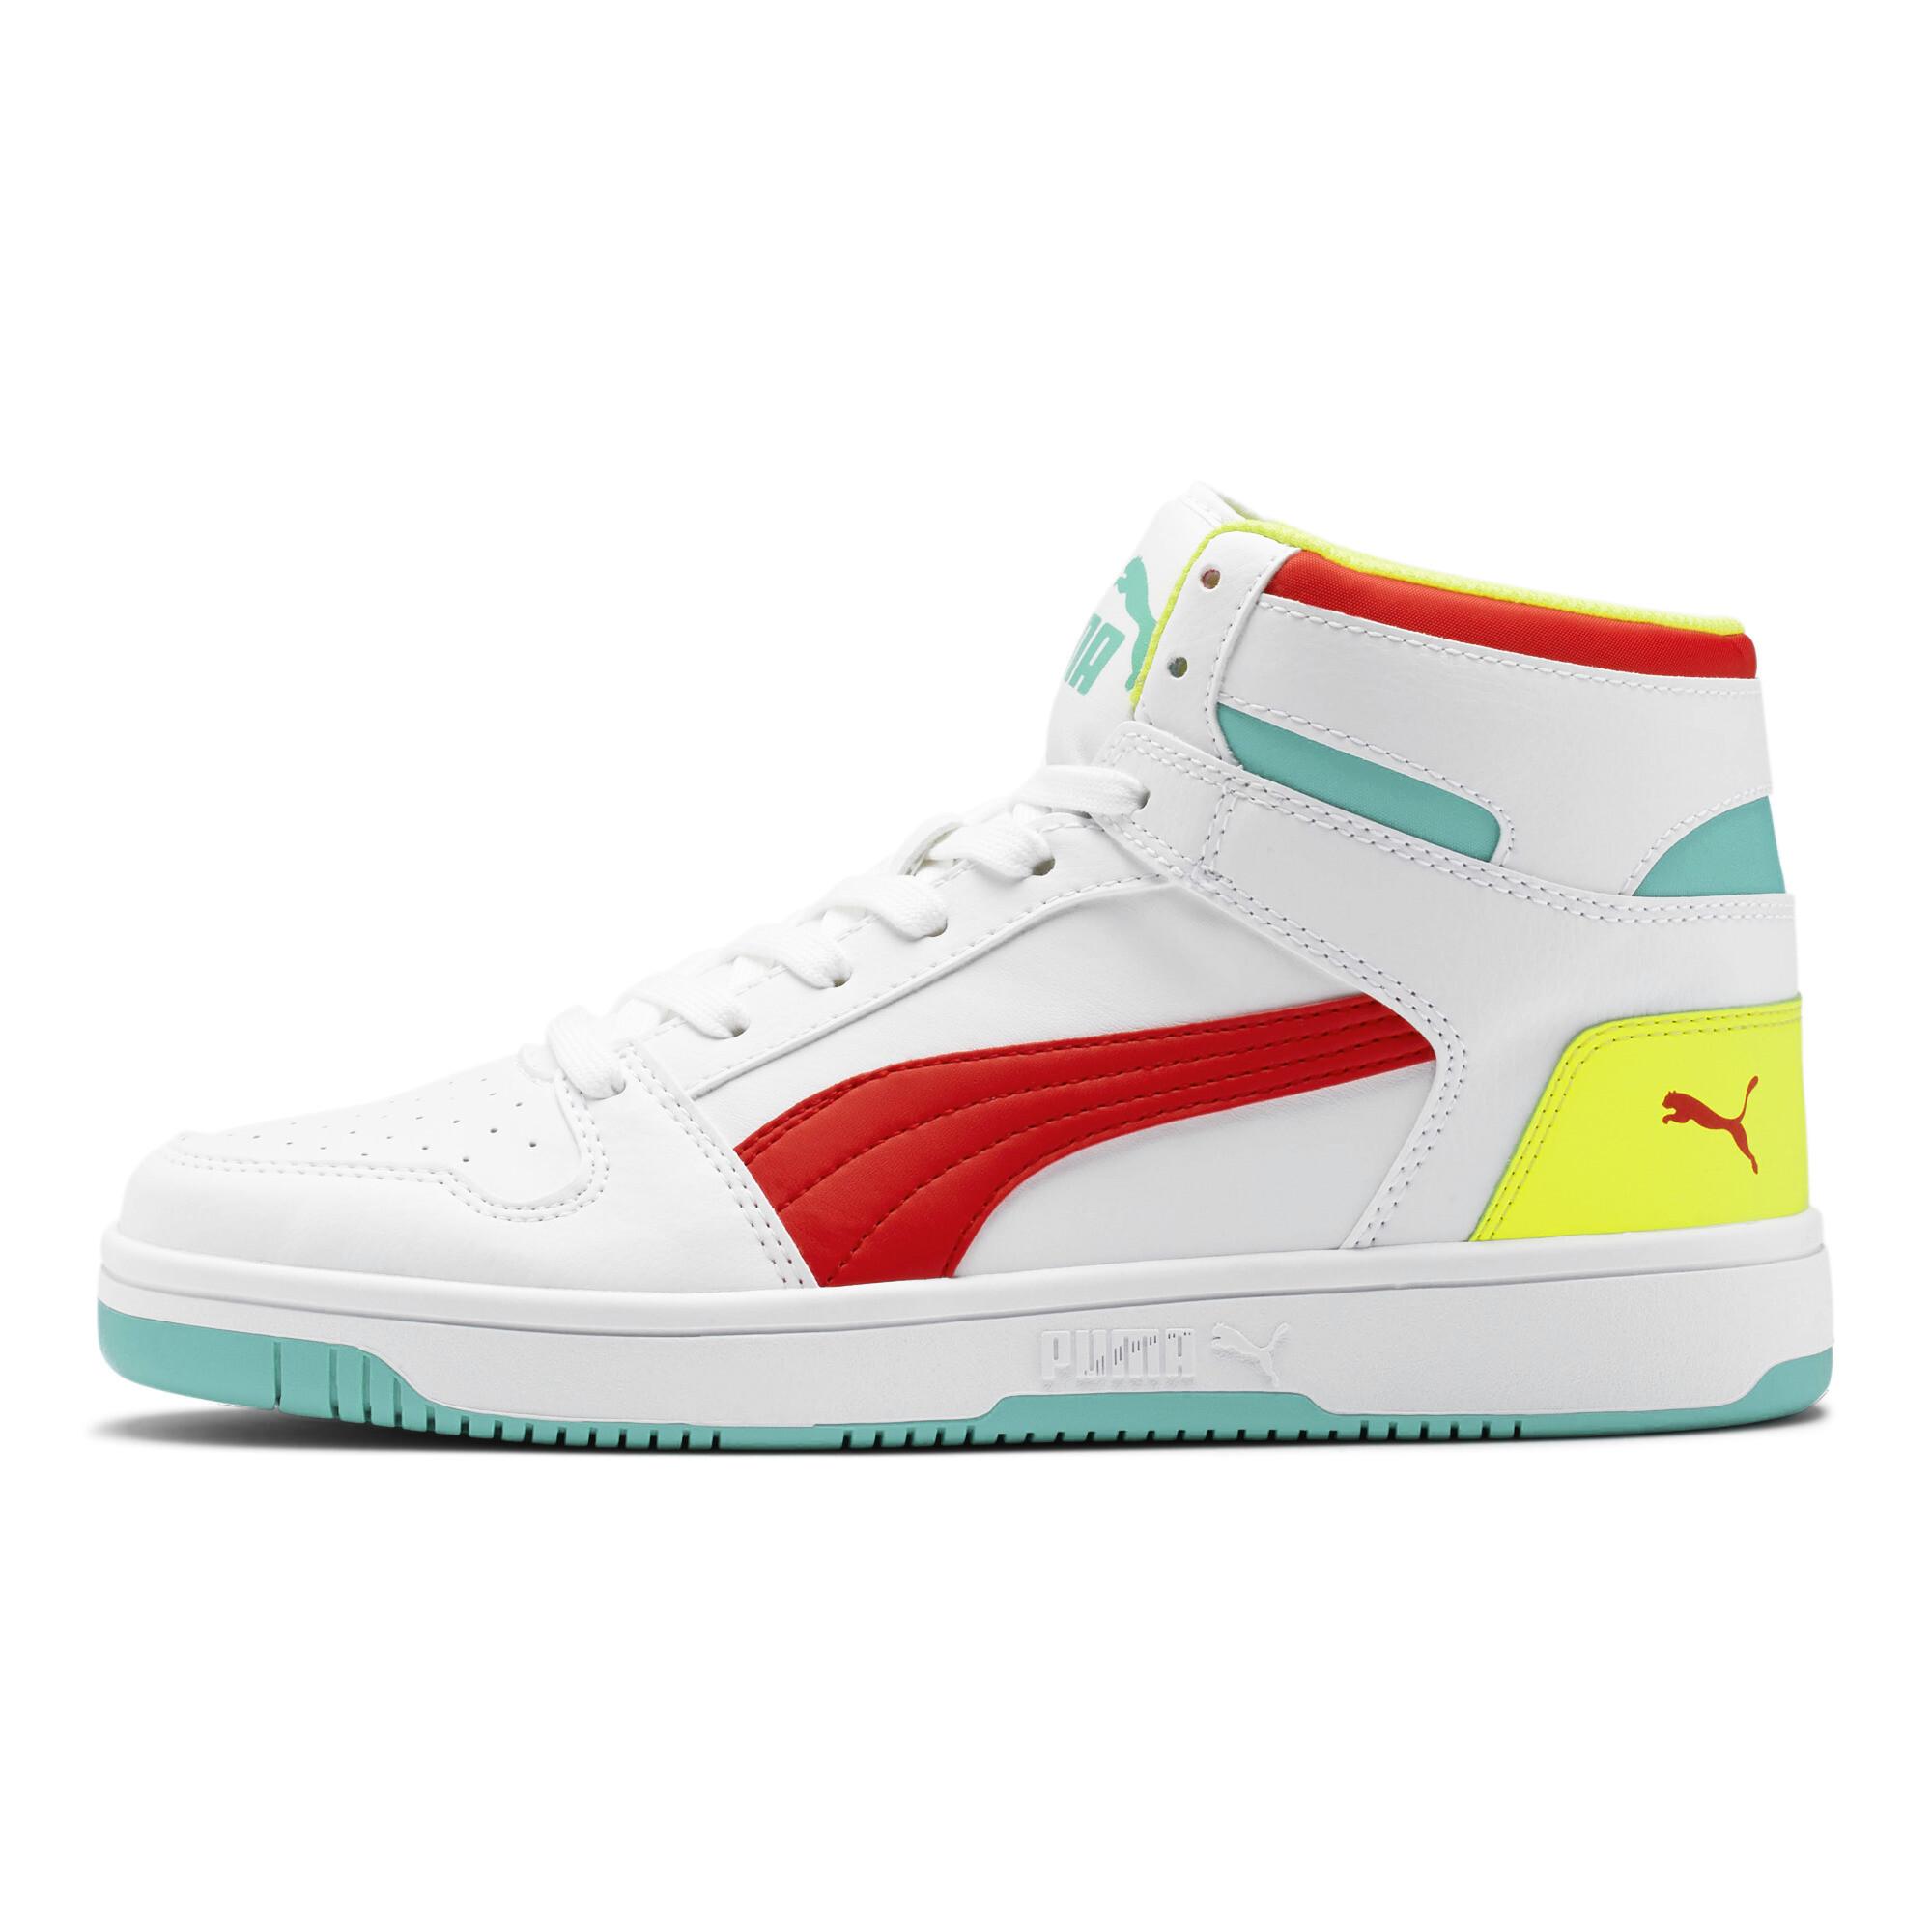 PUMA-PUMA-Rebound-LayUp-Men-039-s-Sneakers-Men-Mid-Boot-Basics thumbnail 22